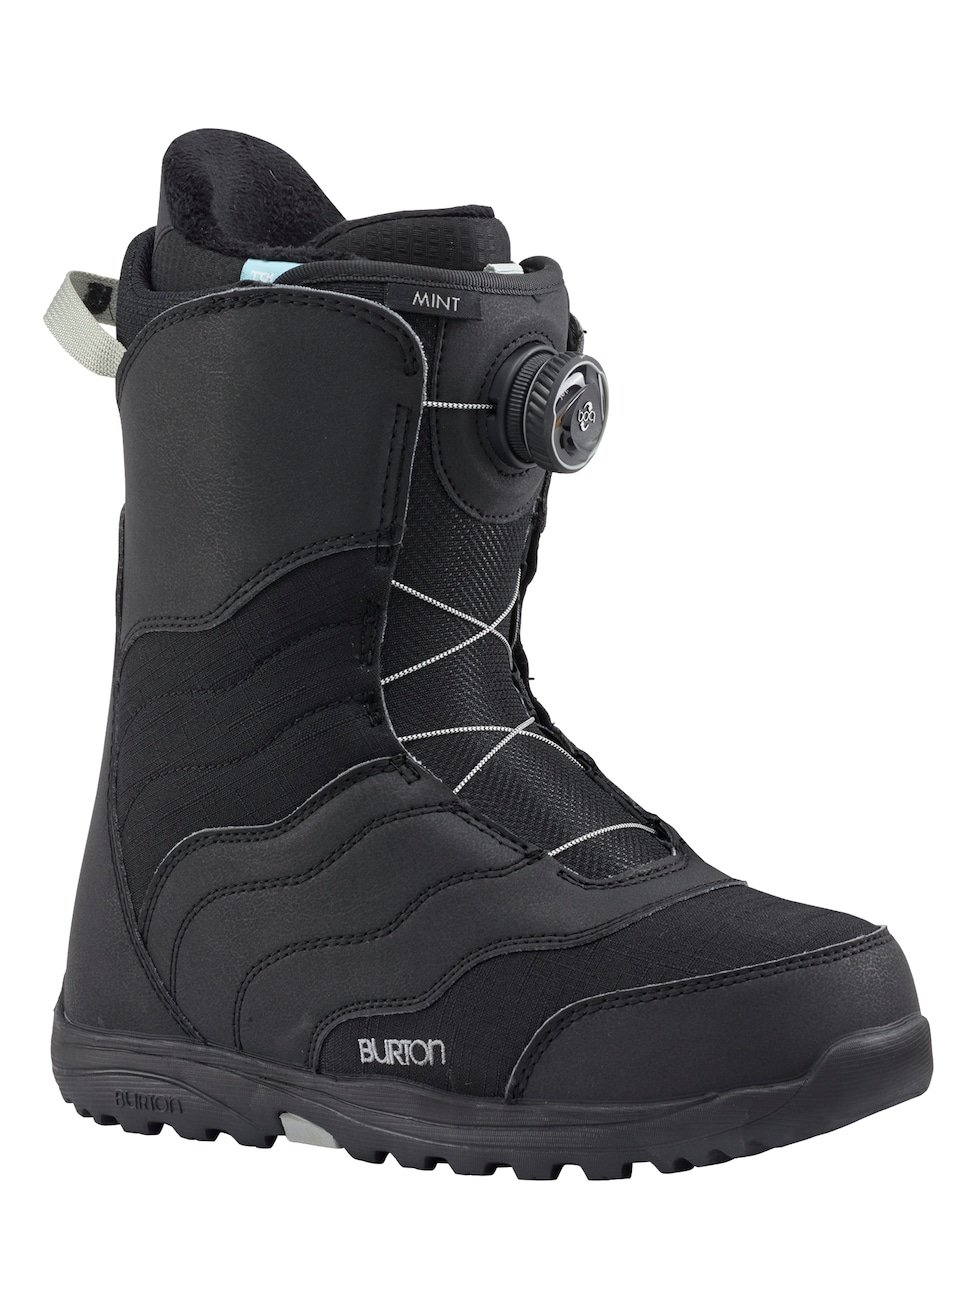 Burton(バートン) スノーボード ブーツ レディースウィメンズ MINT BOAR 2017-18モデル 5~10 131771 スノボ ボア B06X9XNX3K 6|Black Black 6